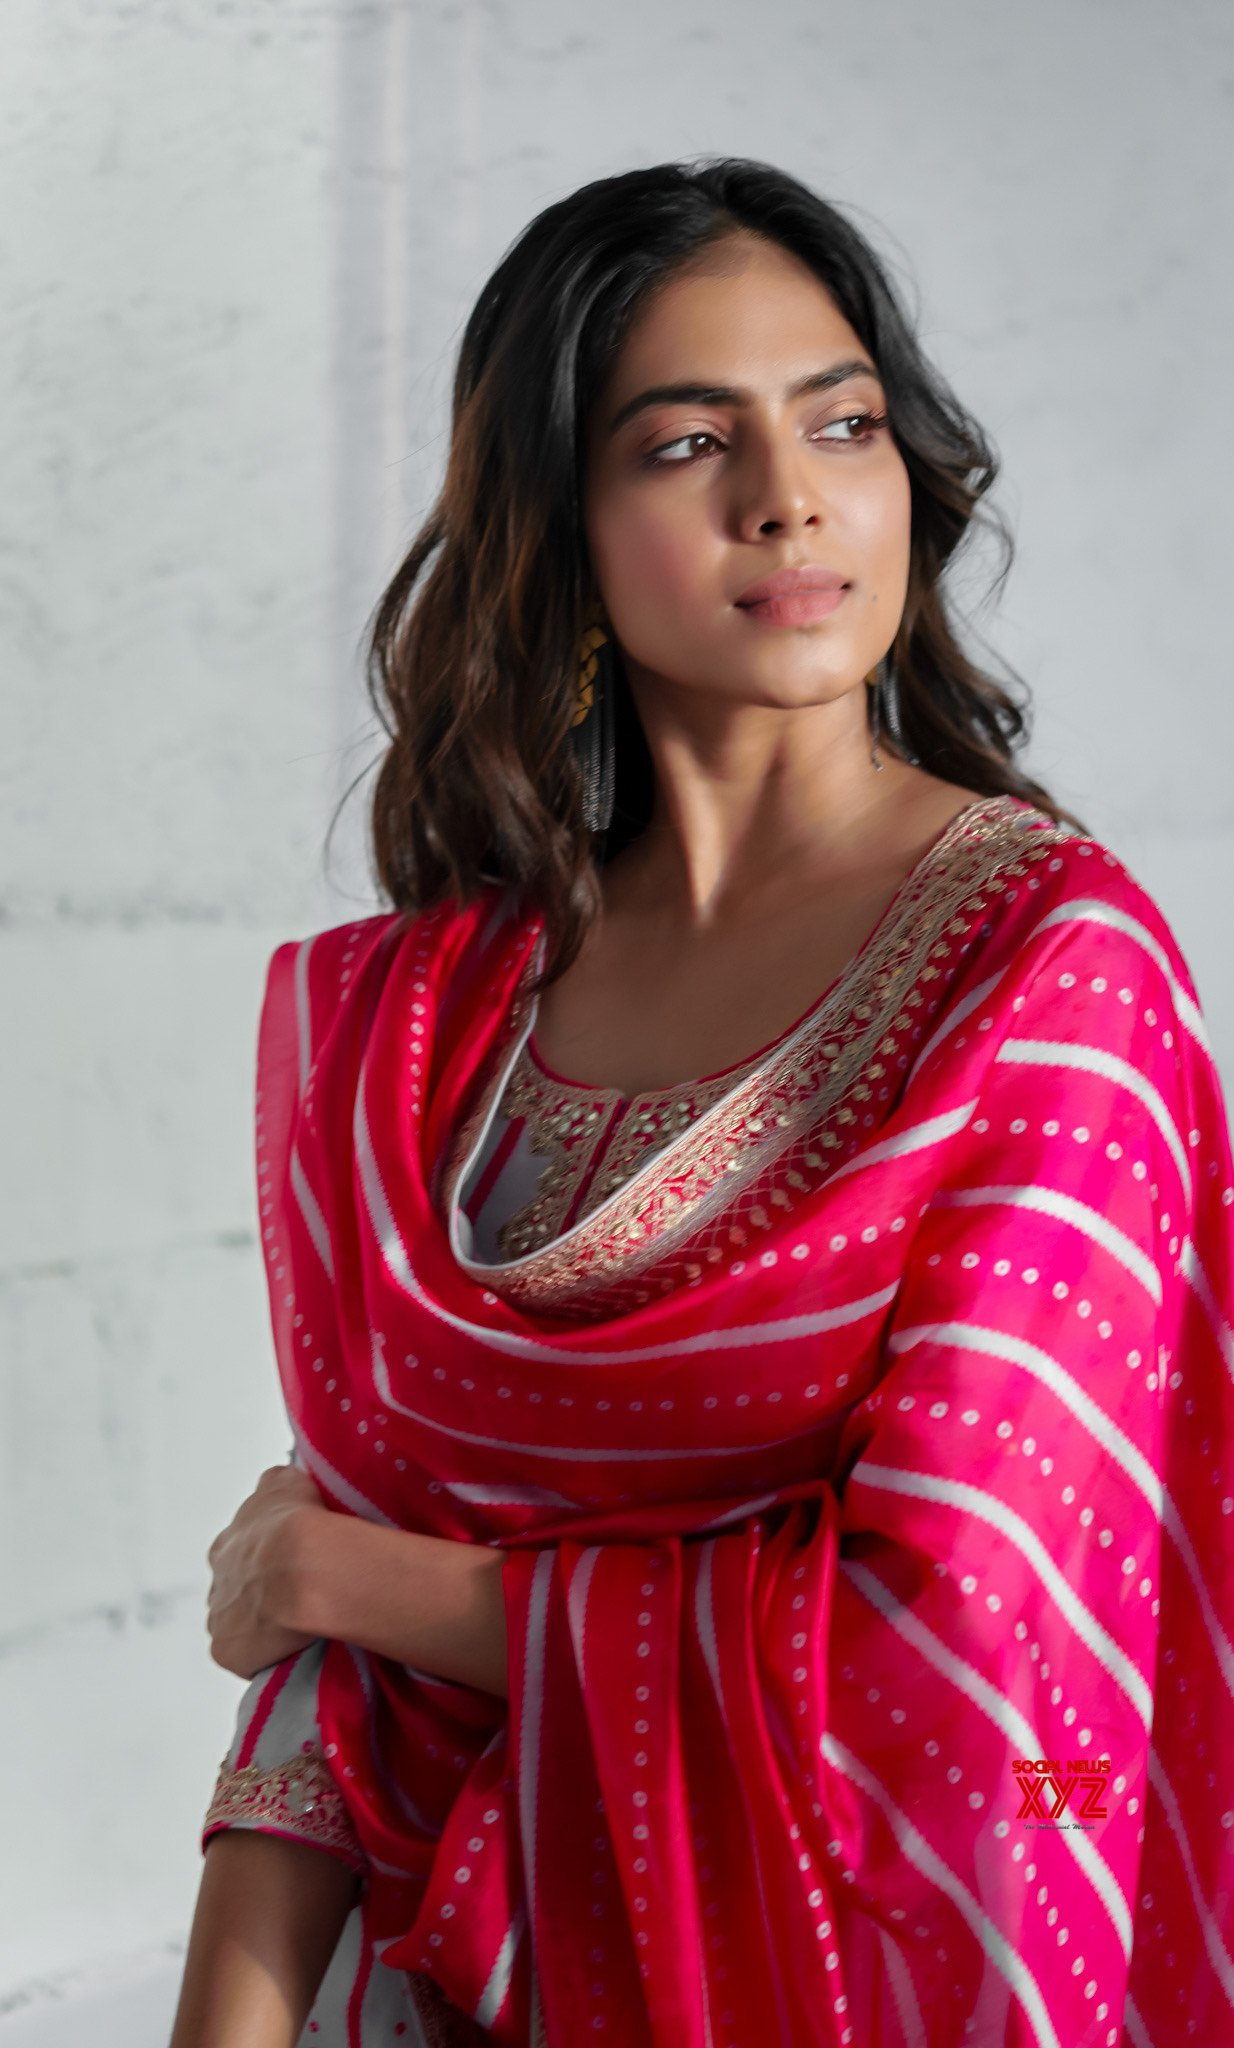 Actress Malavika Mohanan Stills As She Celebrates Navratri Today At Her House In Mumbai